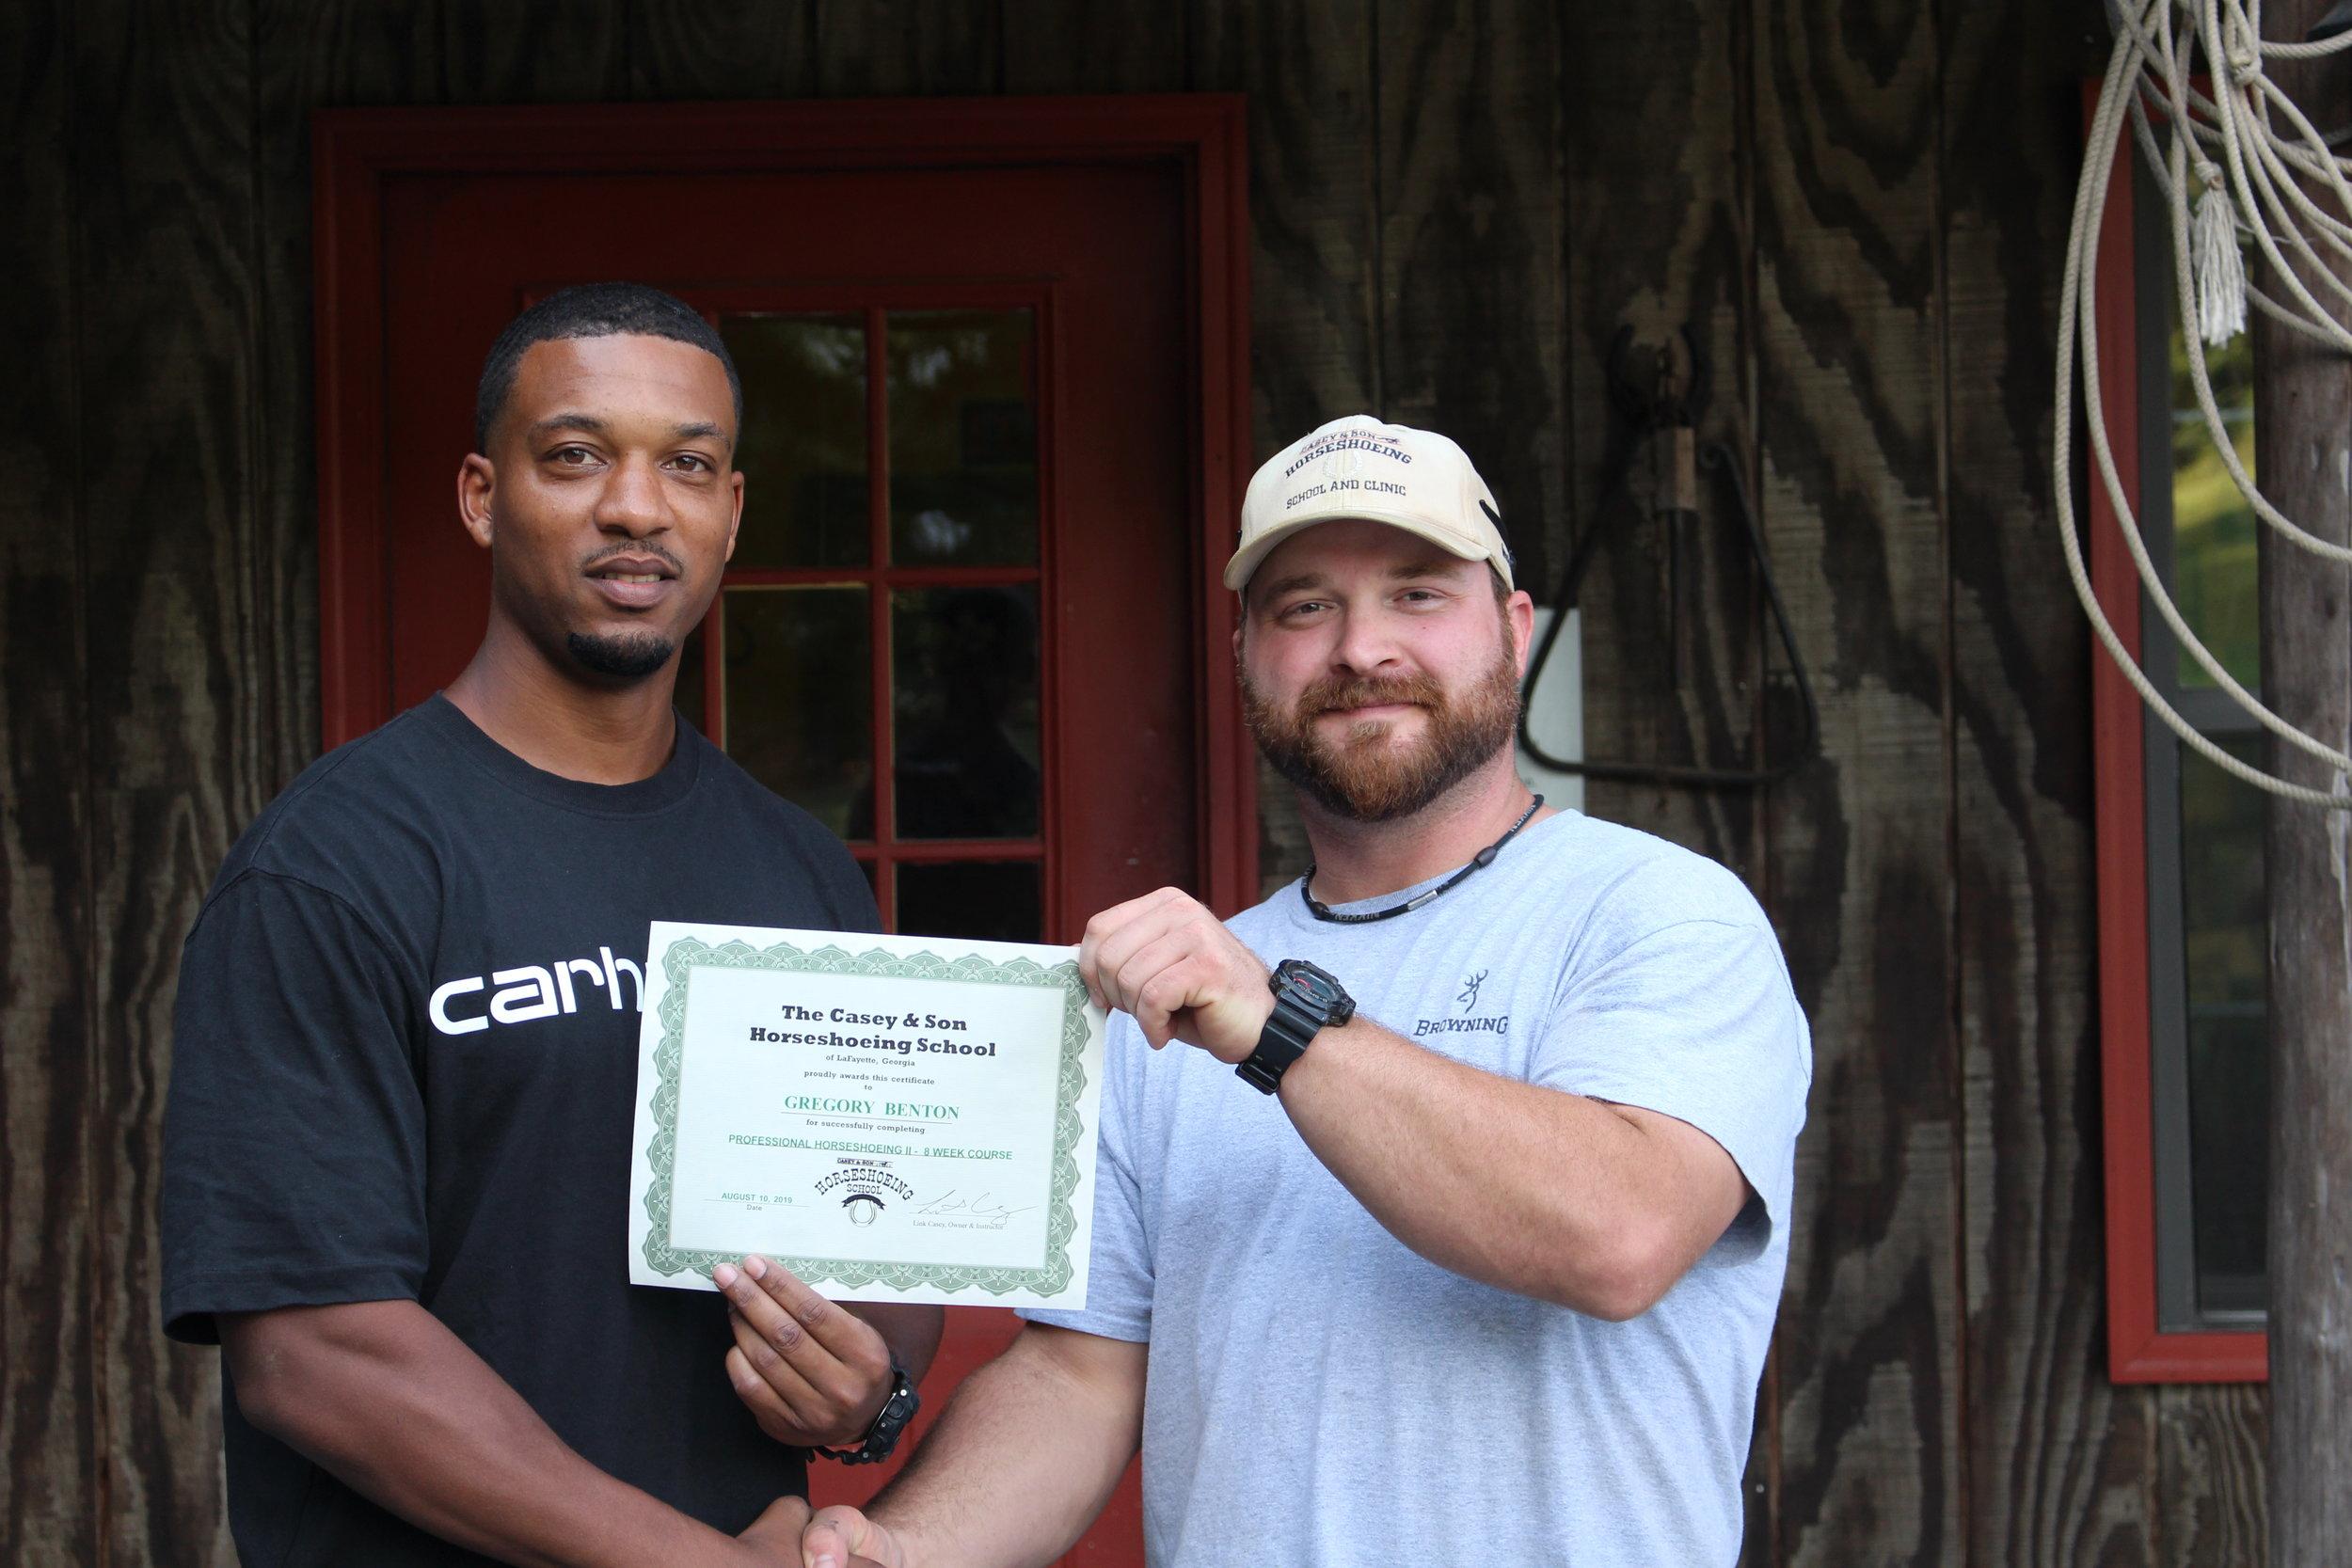 Gregory Benton, MS, Veteran with Owner & Instructor Link Casey.